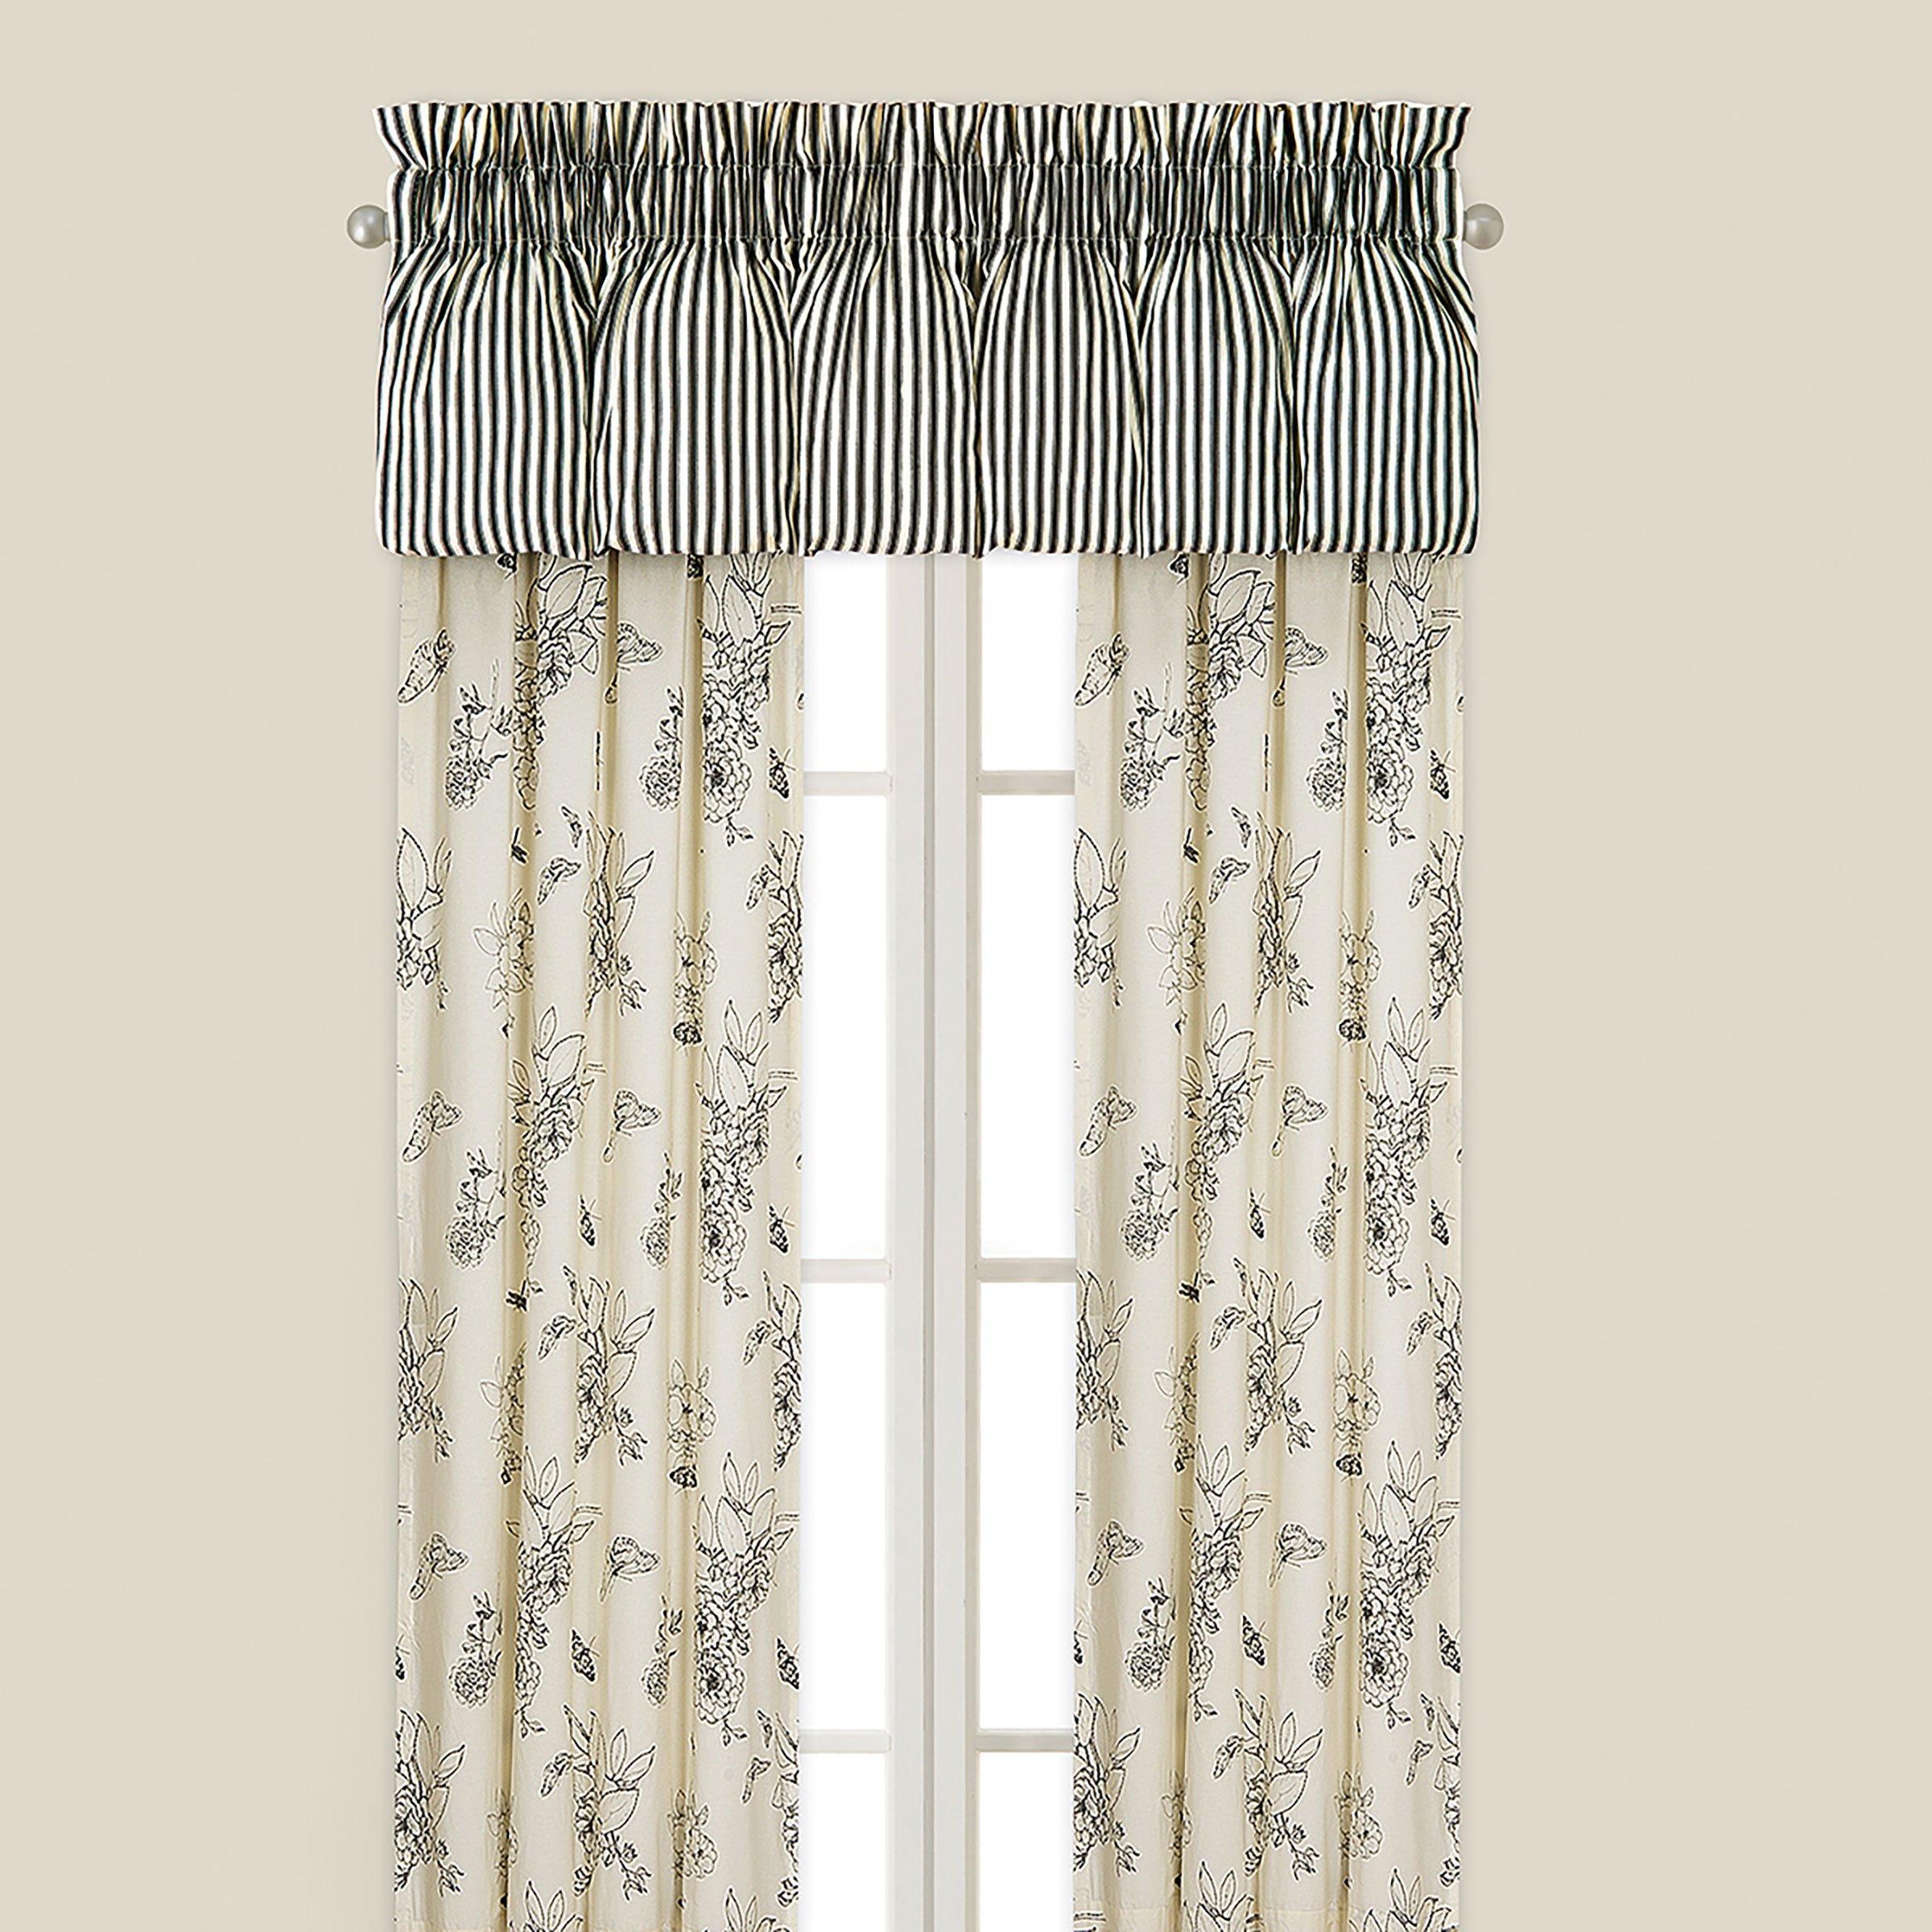 Dandridge Botanical Drapery Panel, Natural/Black